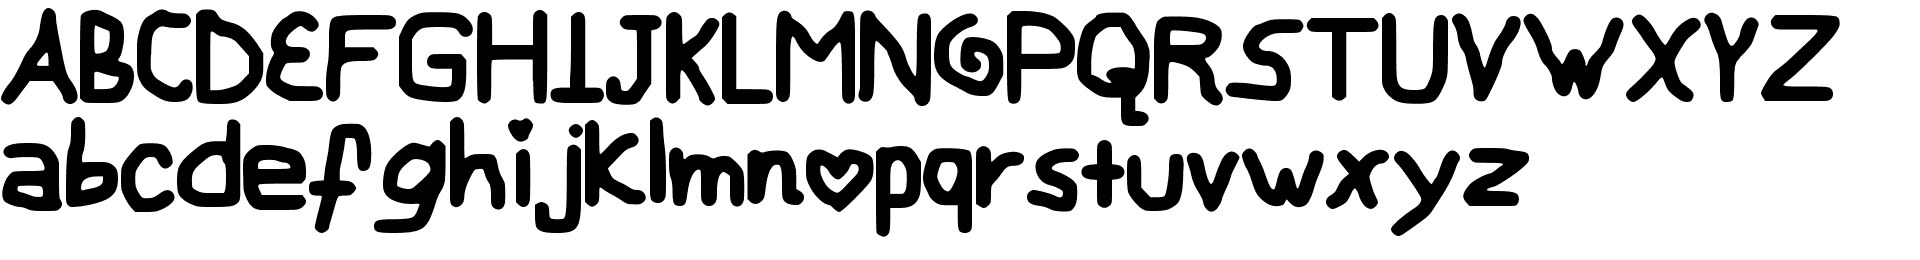 My Childish Font